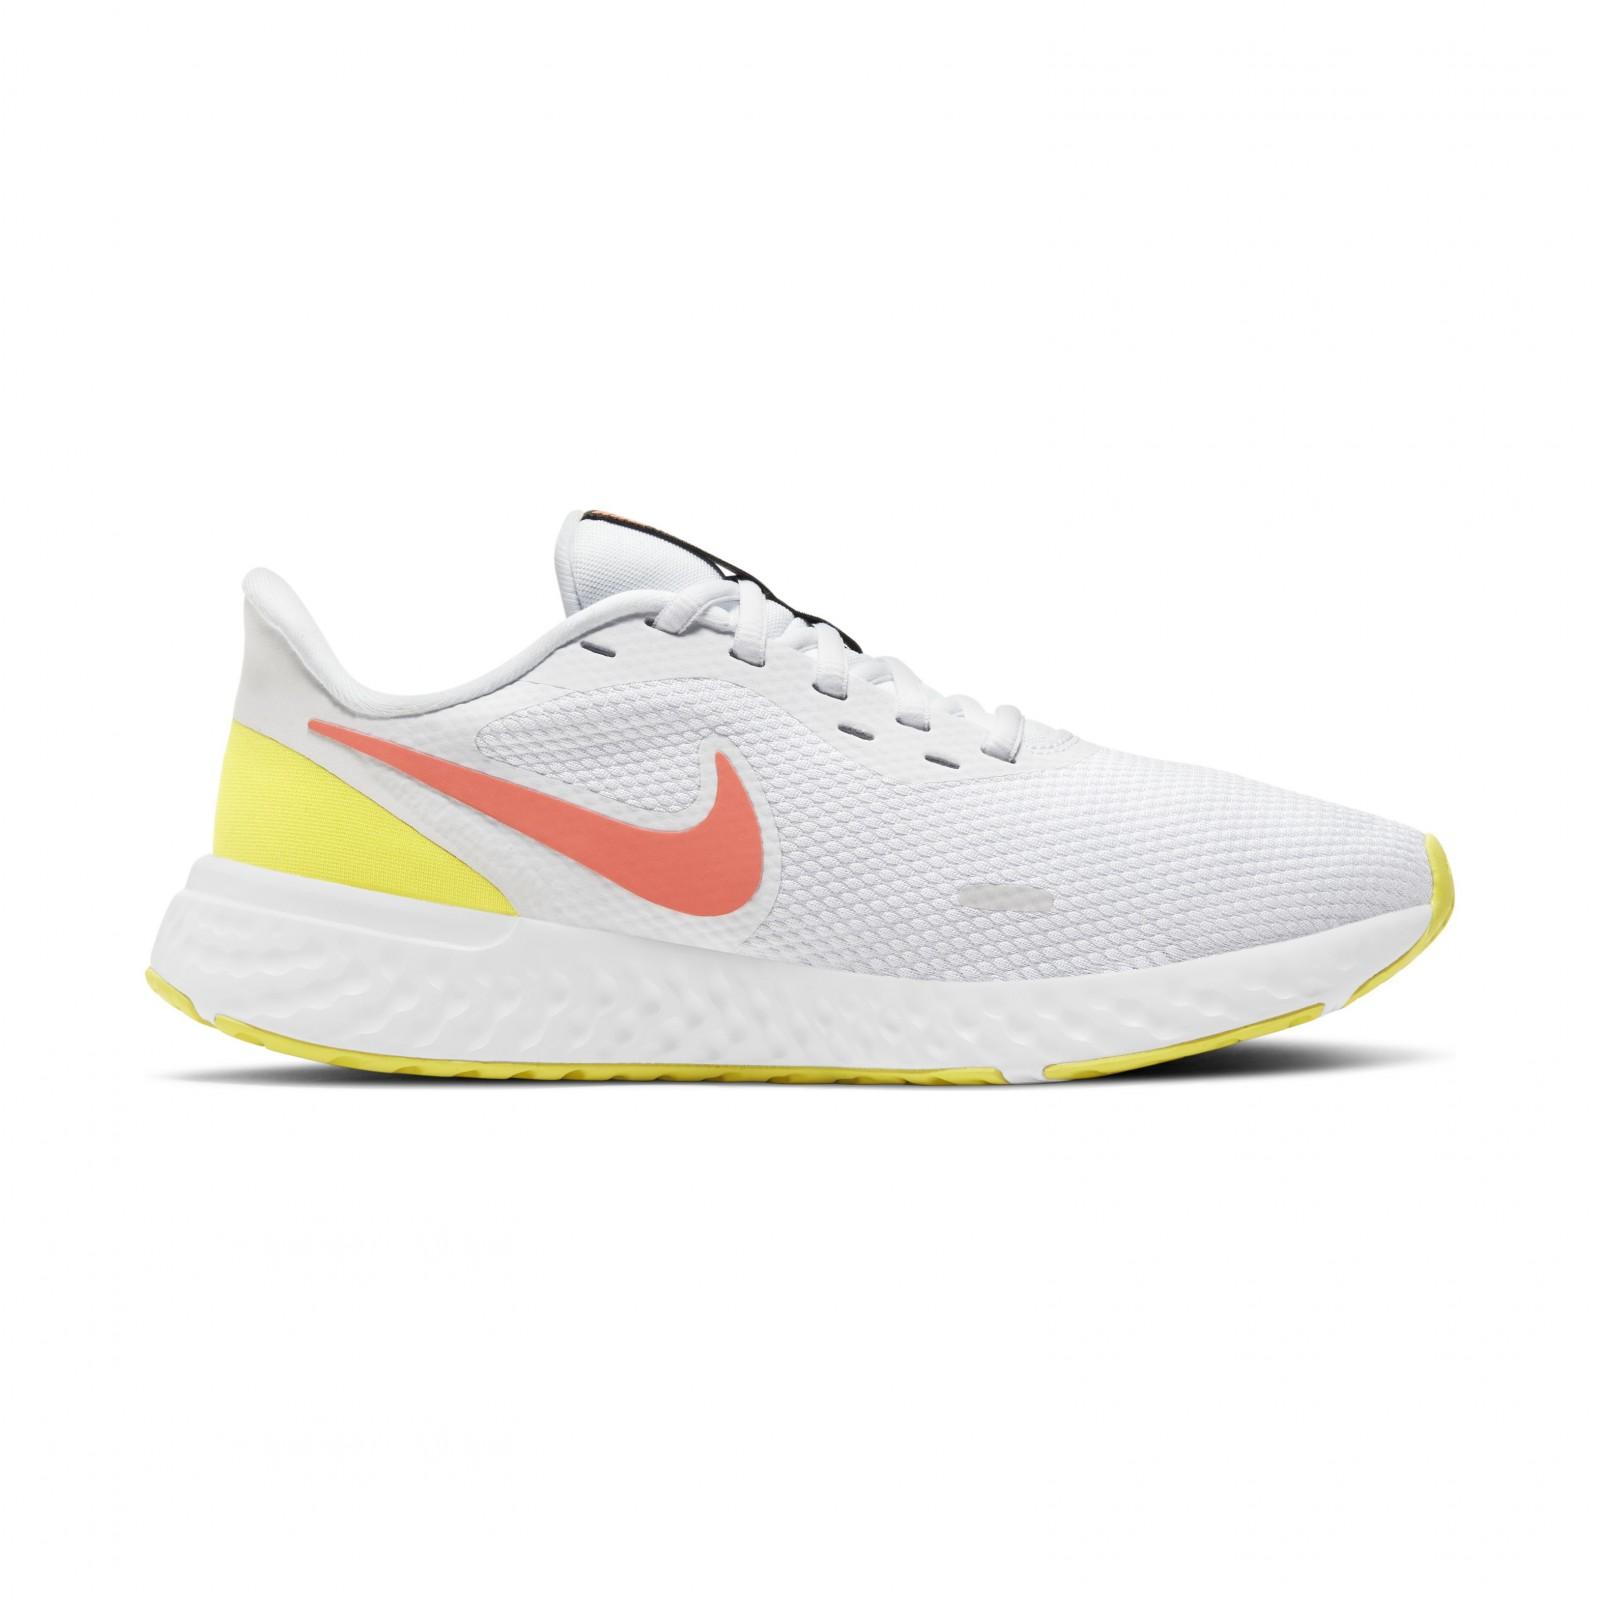 Nike Revolution 5 WHITE/BRIGHT MANGO-LT VLTGE YLW II-BLACK